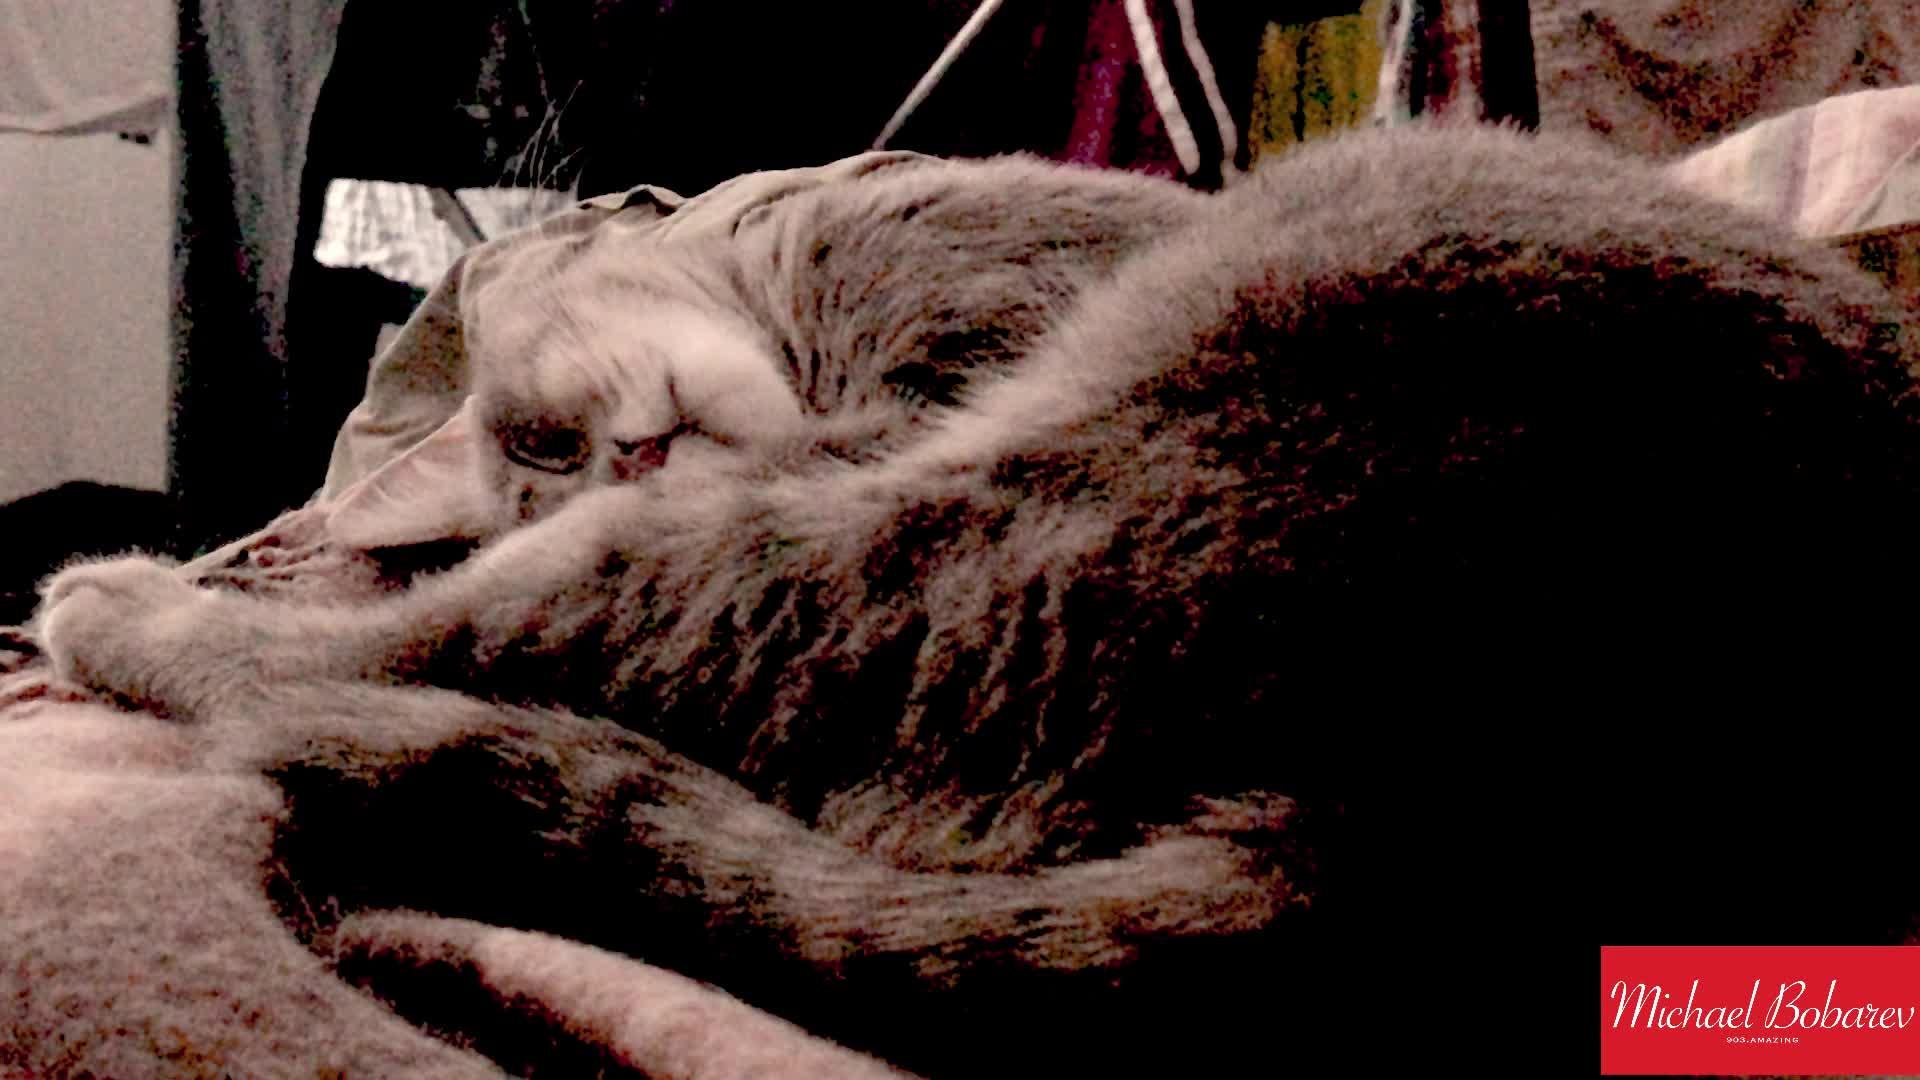 cat, cats, cute, likeus, sleep, sleepy, stress, stressful, Stressful sleep GIFs